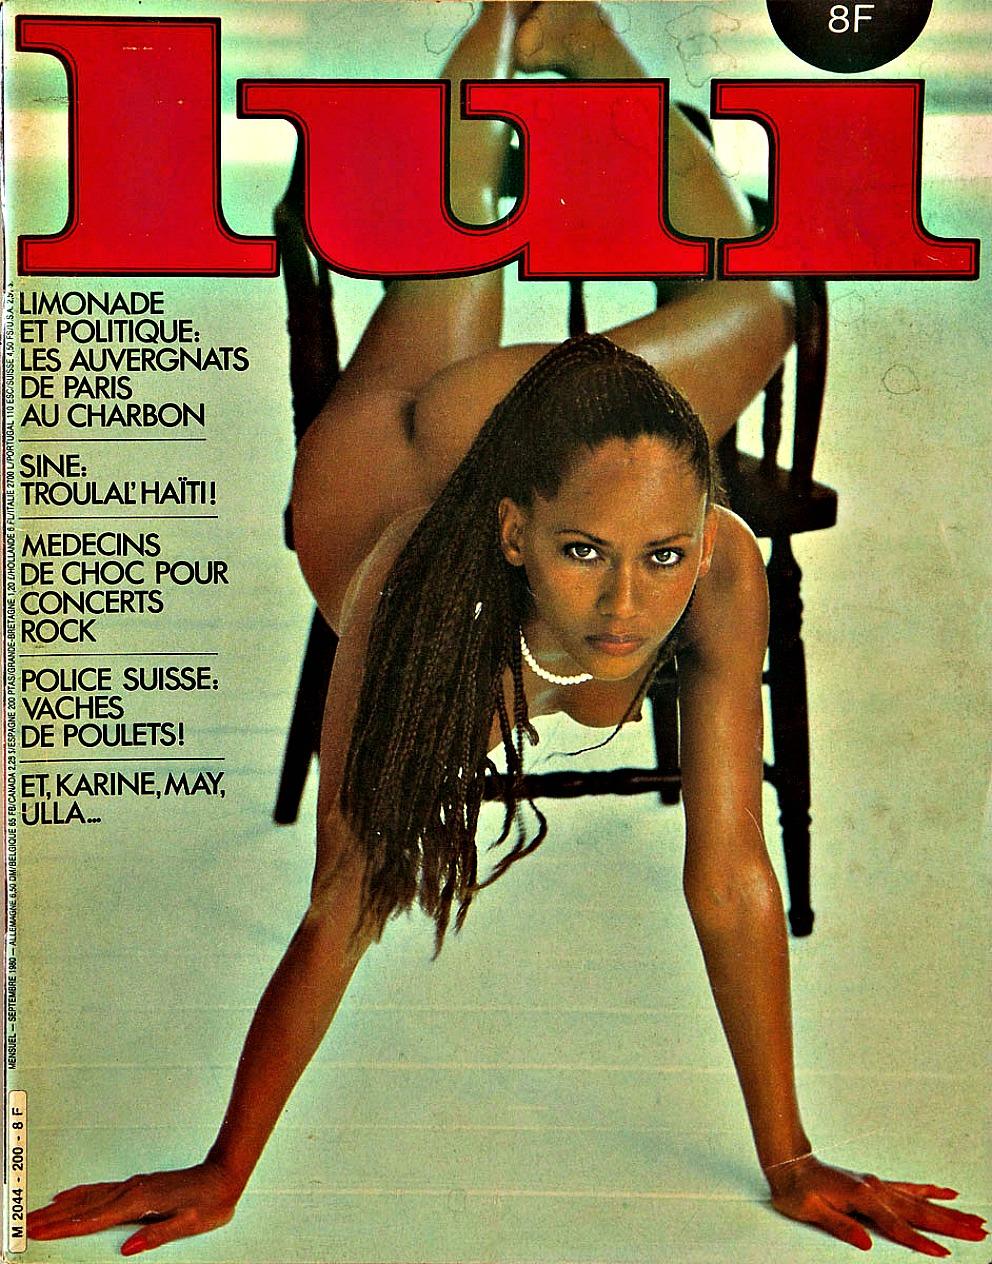 Французский журнал для мужчин Lui 1980 года